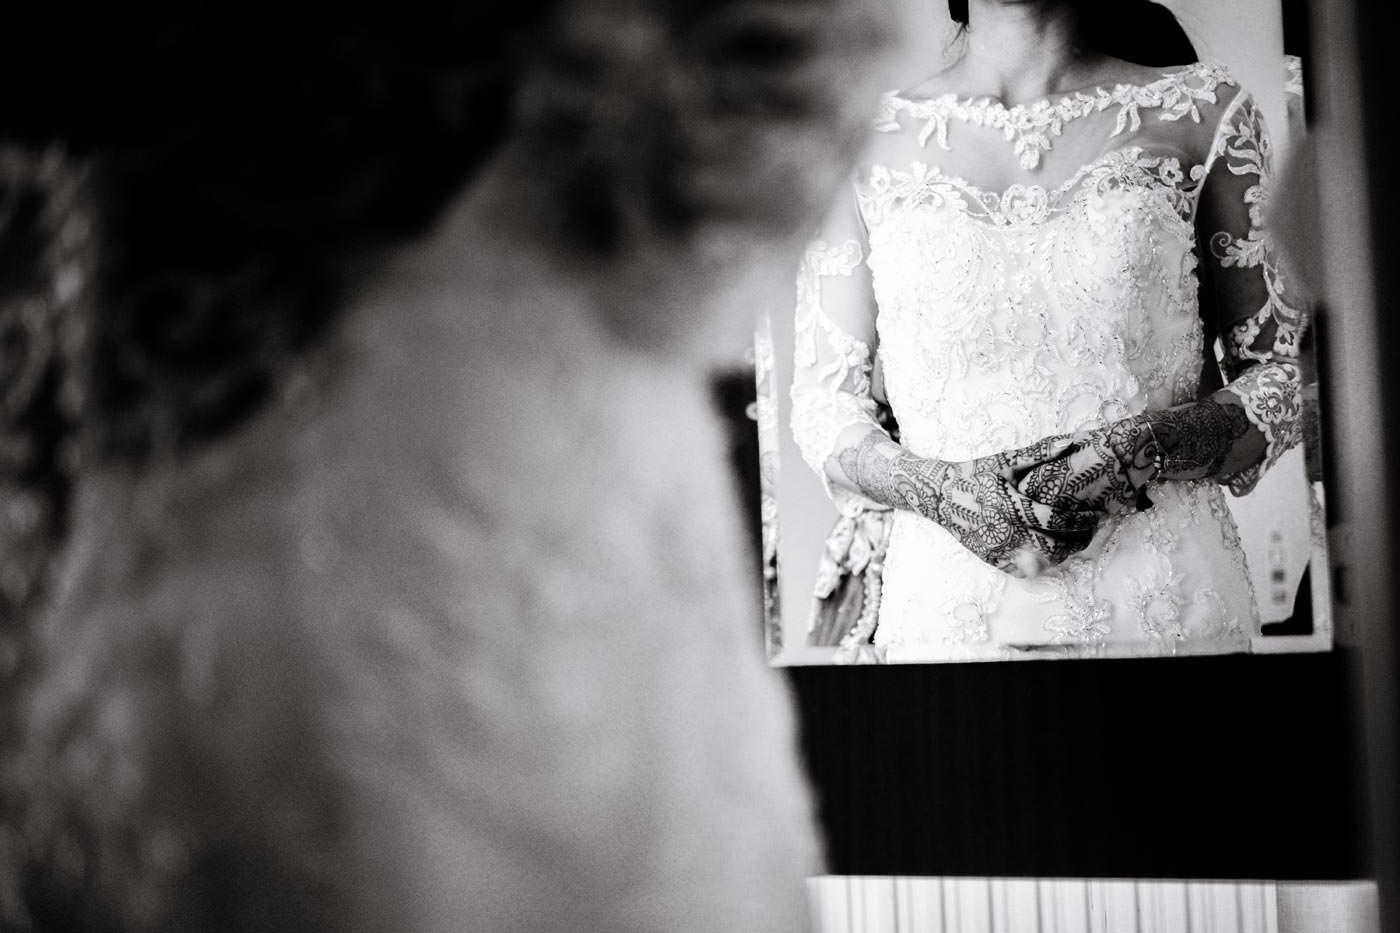 Indian bride's hands refelcted in mirror showing her mehndi